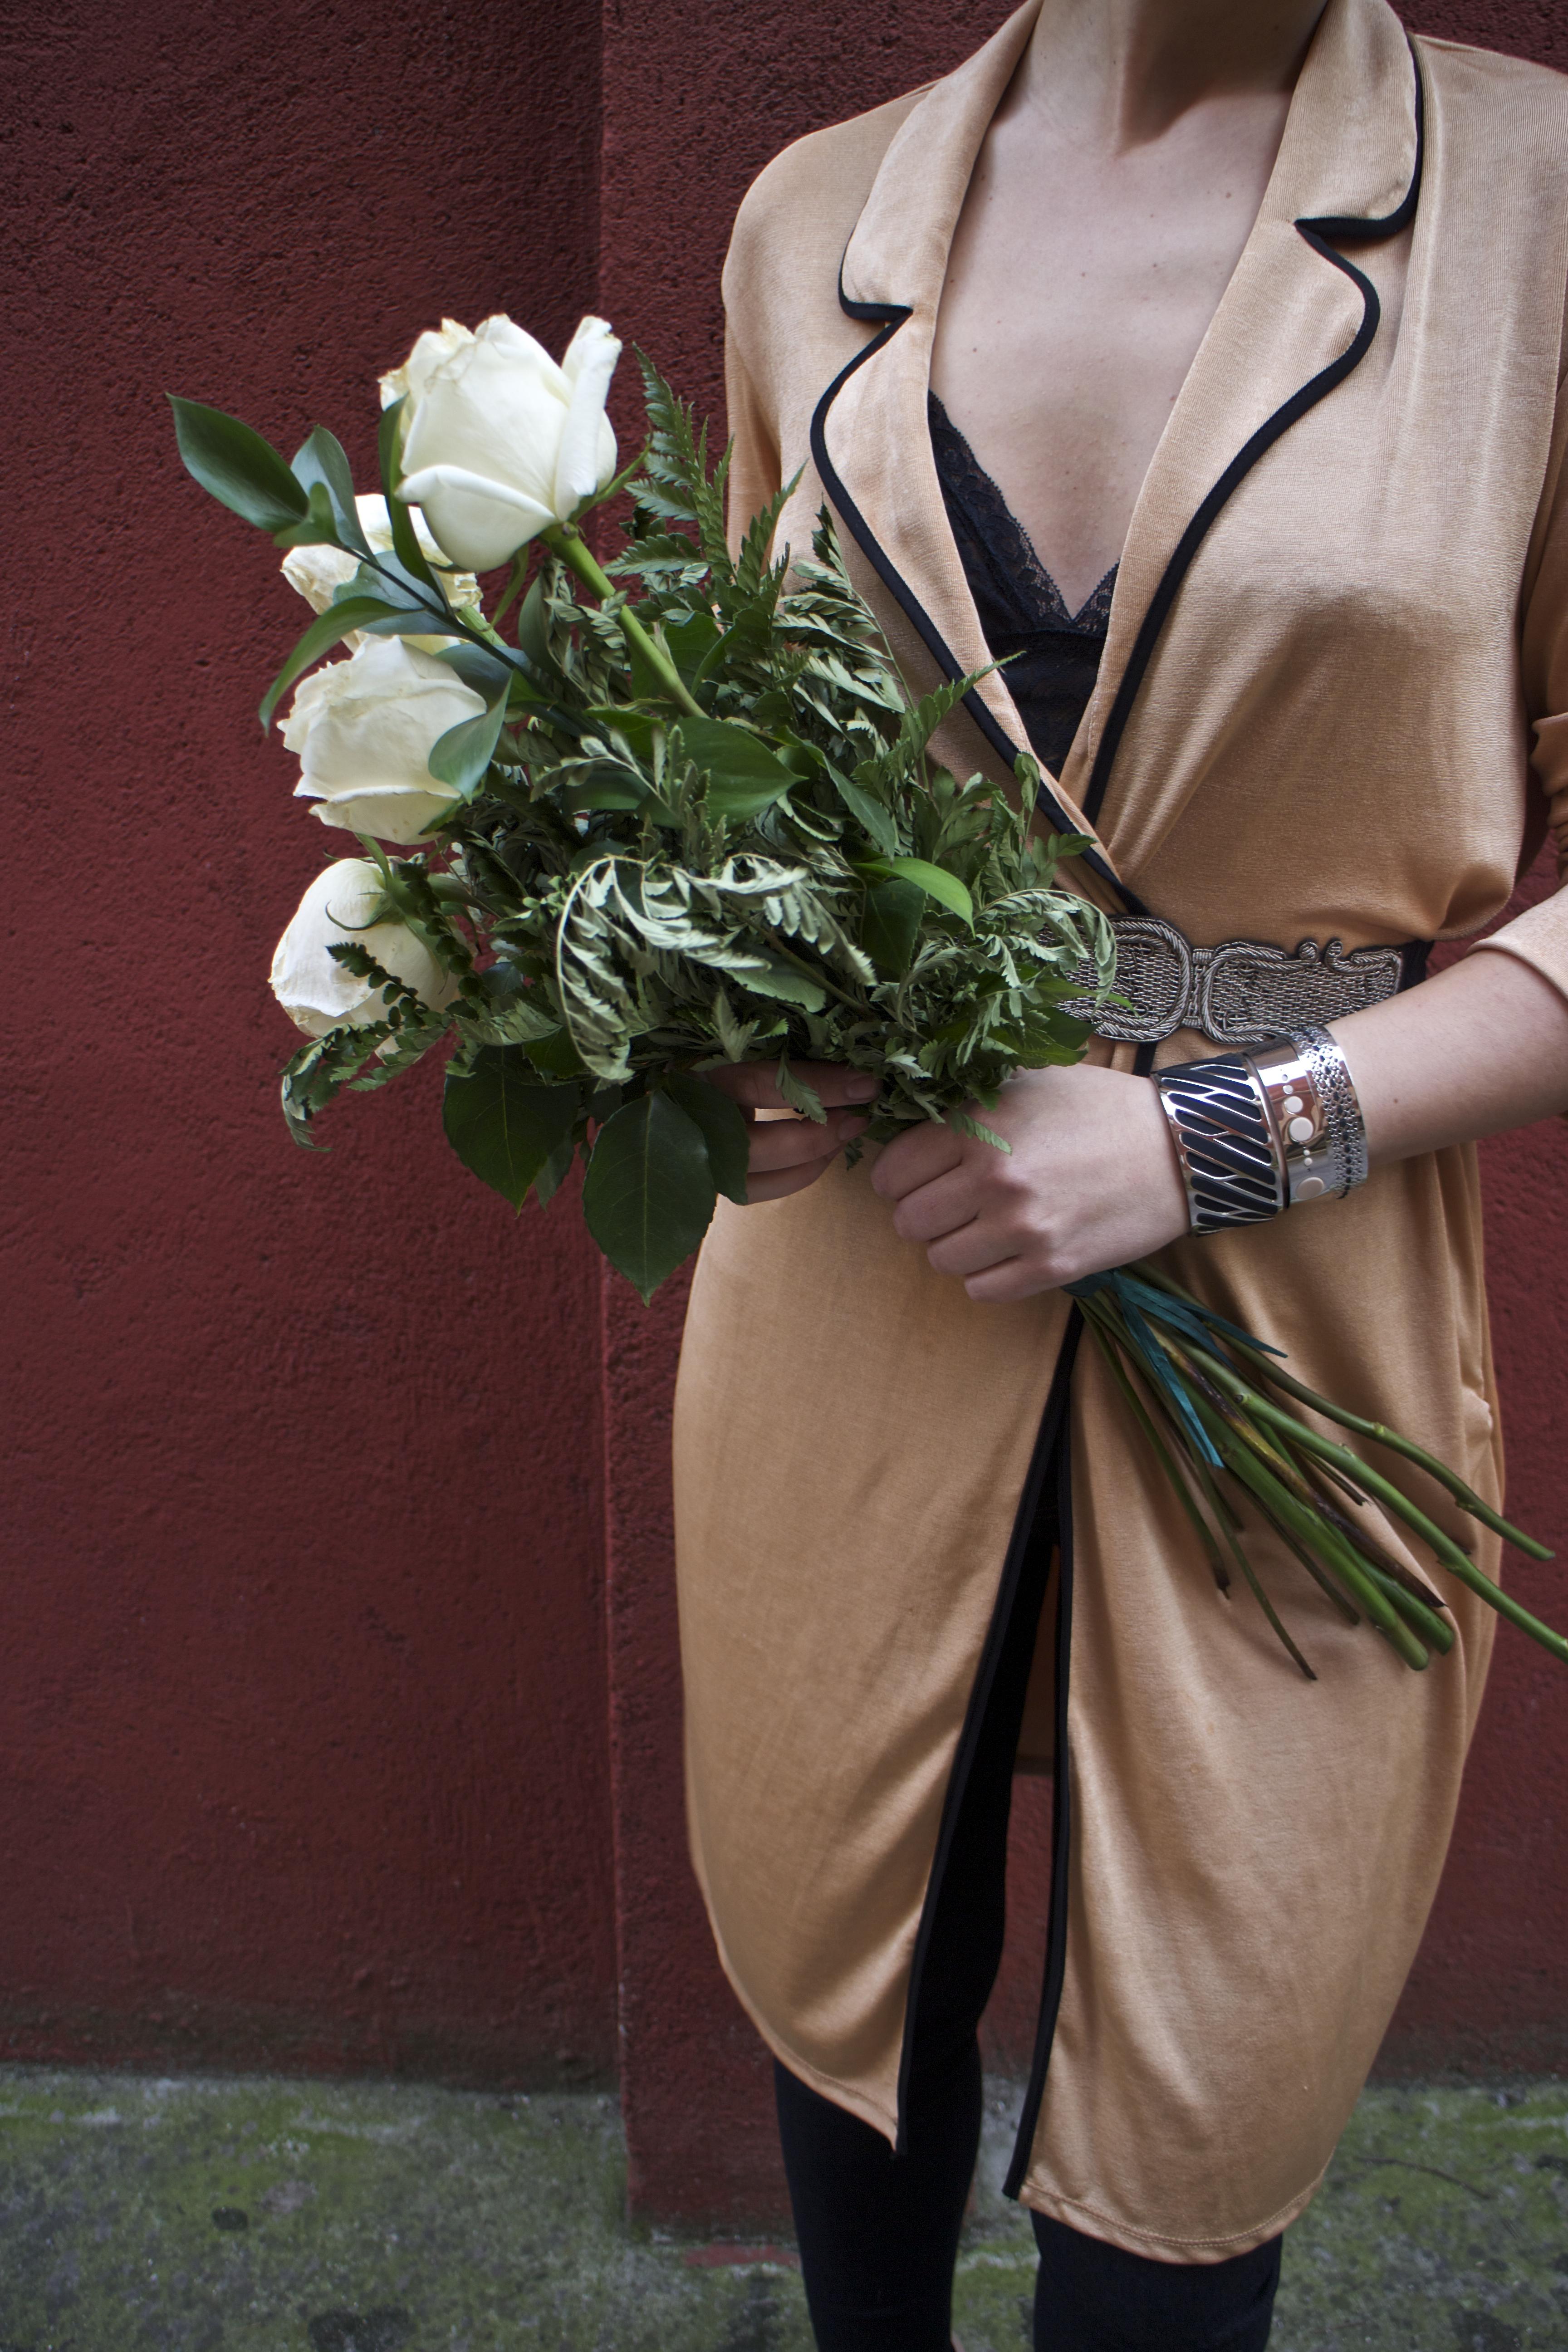 embajadora The Rubz pulseras bata Zara Paula Fraile amaras la moda flores